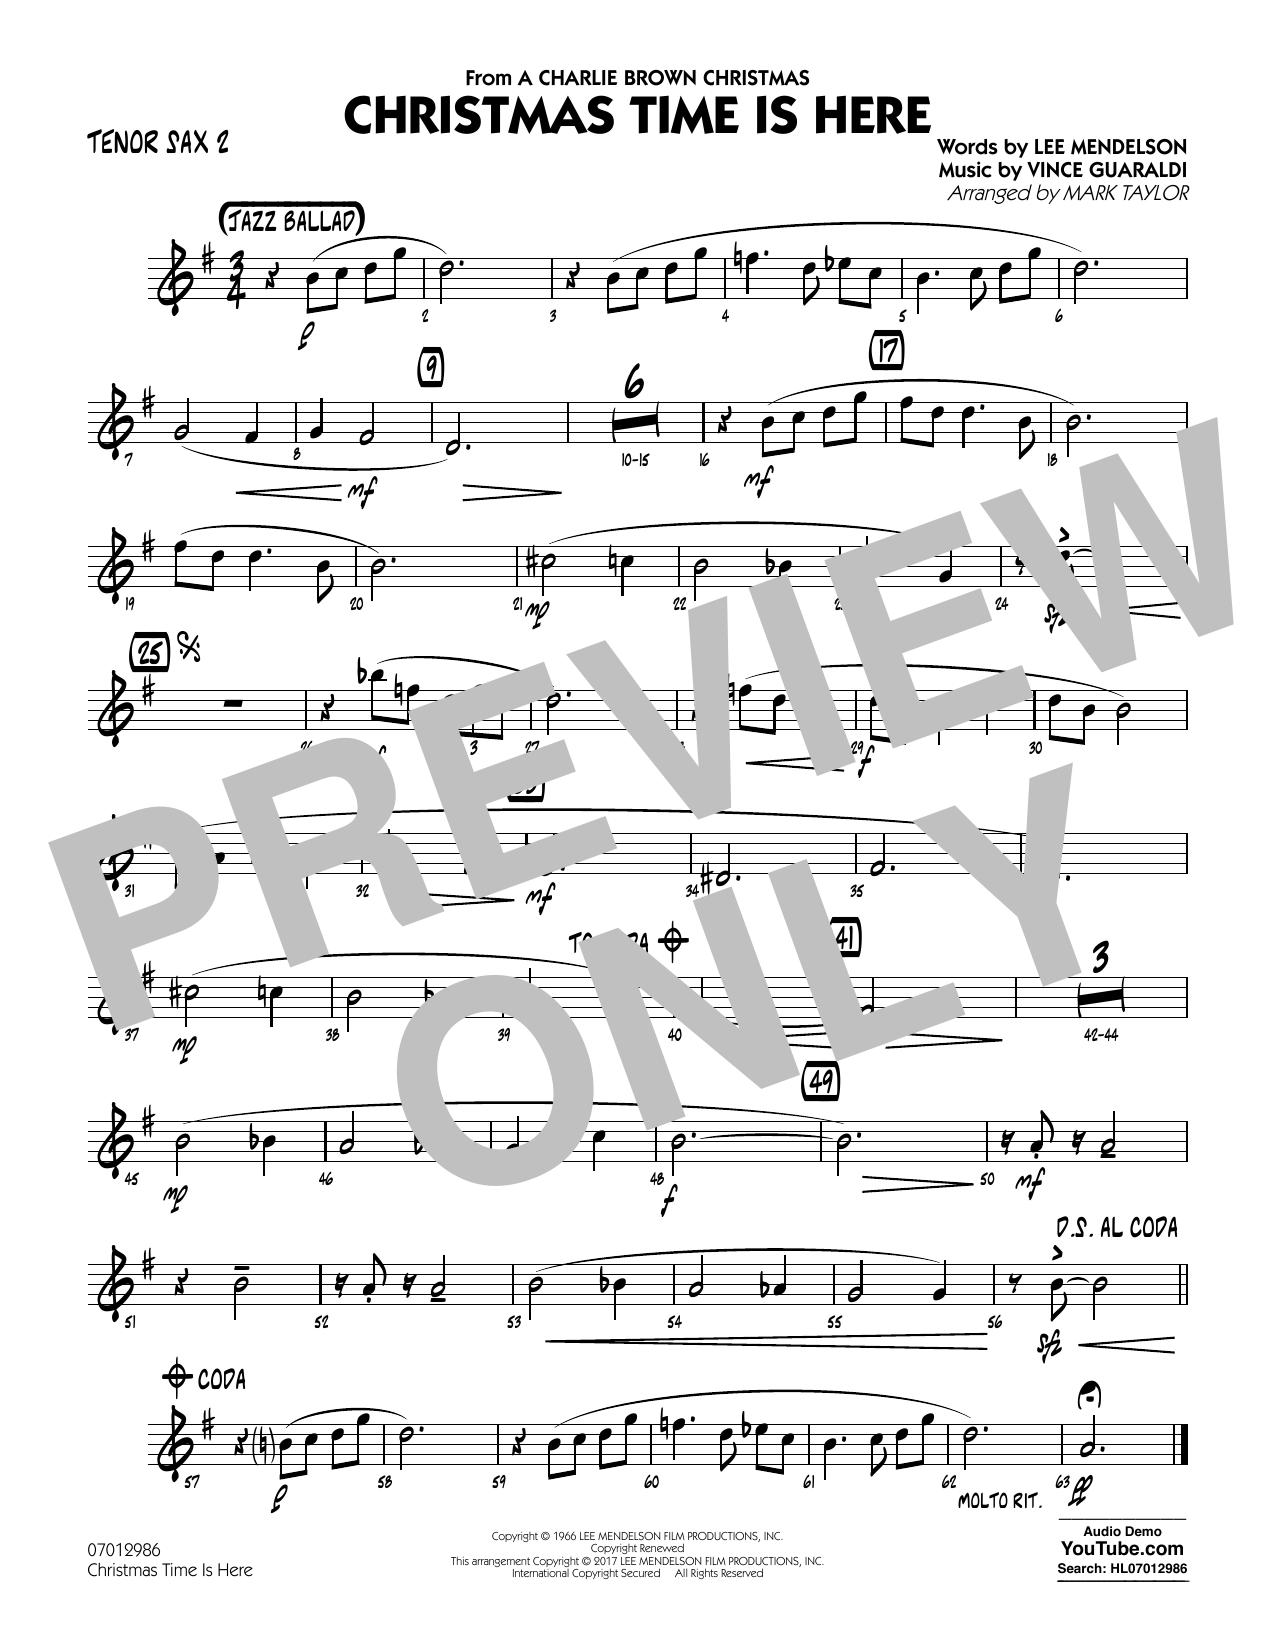 Christmas Time Is Here - Tenor Sax 2 Sheet Music